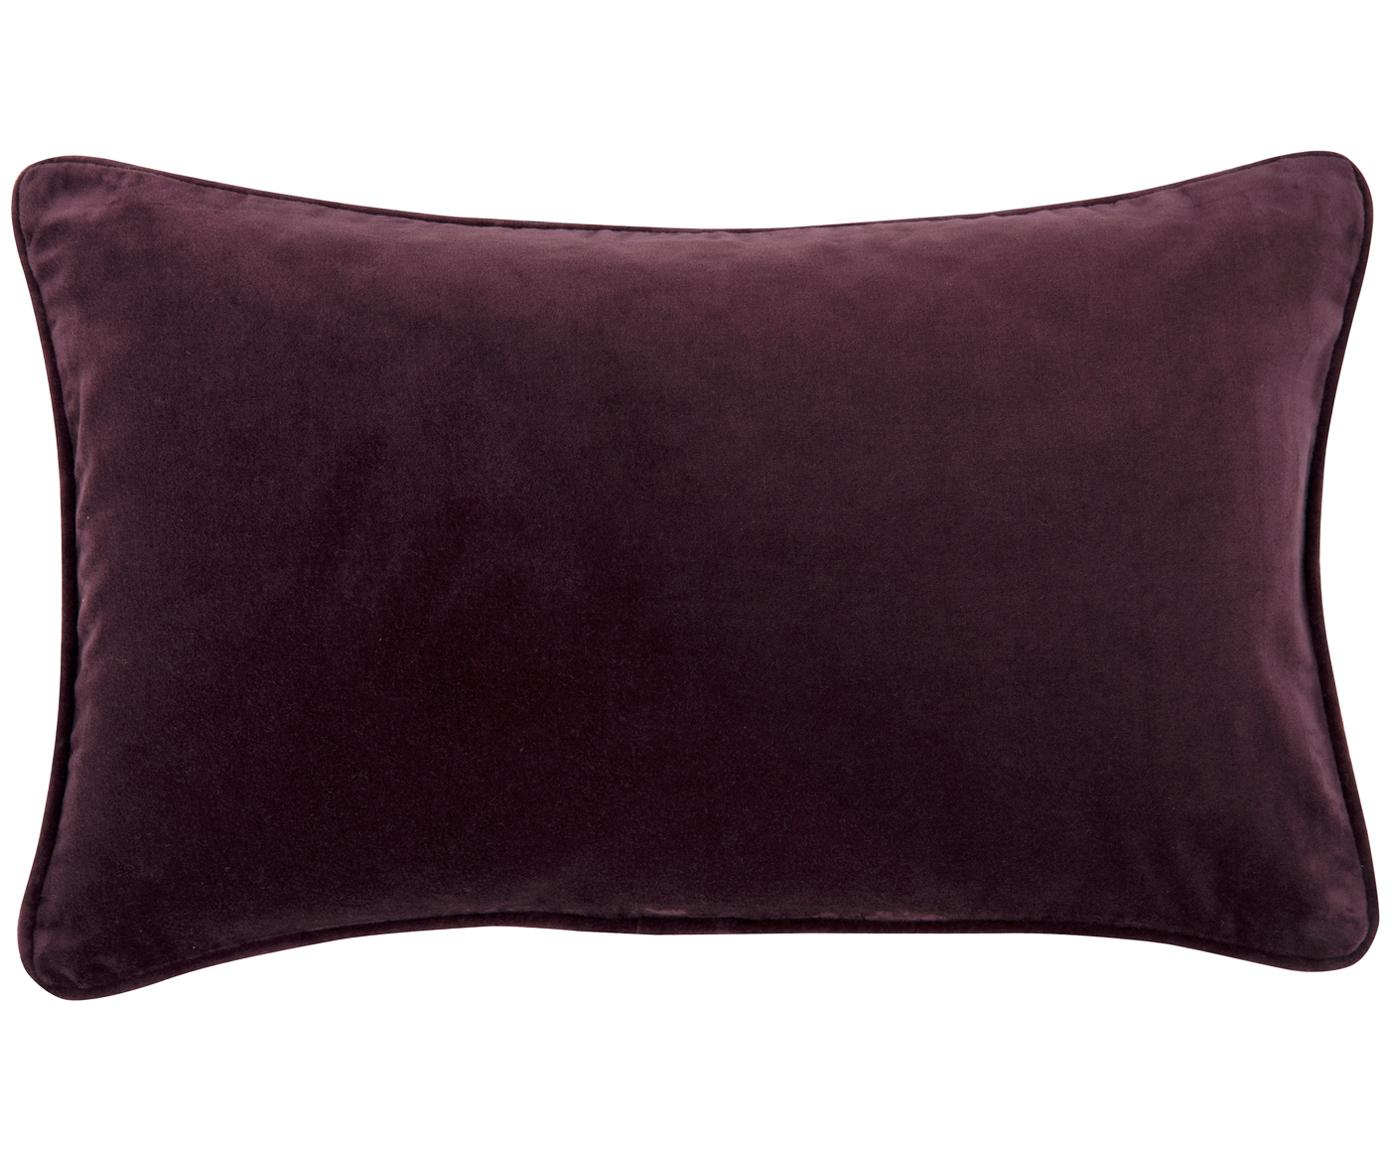 Funda de cojín de terciopelo Dana, 100%terciopelo, Color berenjena, An 30 x L 50 cm